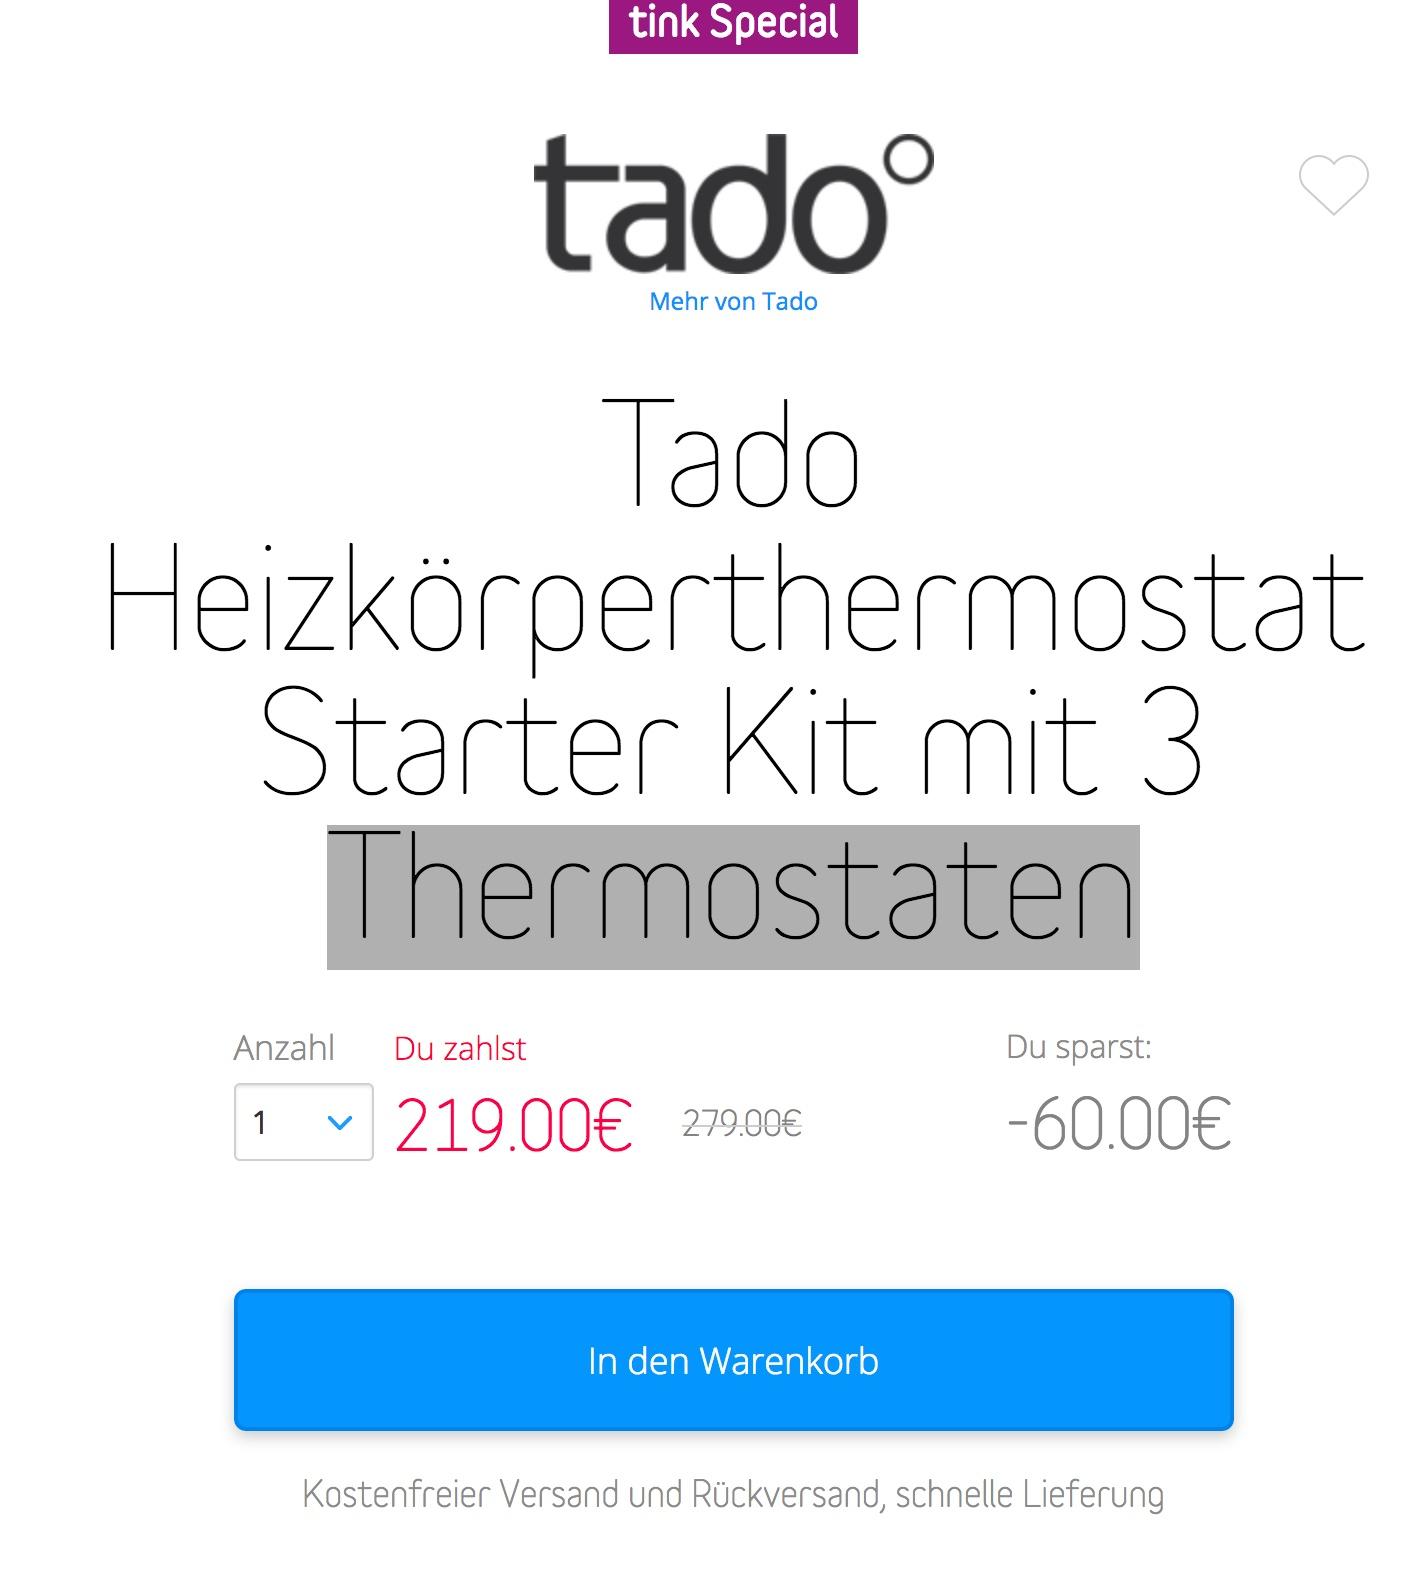 tado heizk rperthermostat starter kit mit 3 thermostaten black friday 2016 best preis. Black Bedroom Furniture Sets. Home Design Ideas